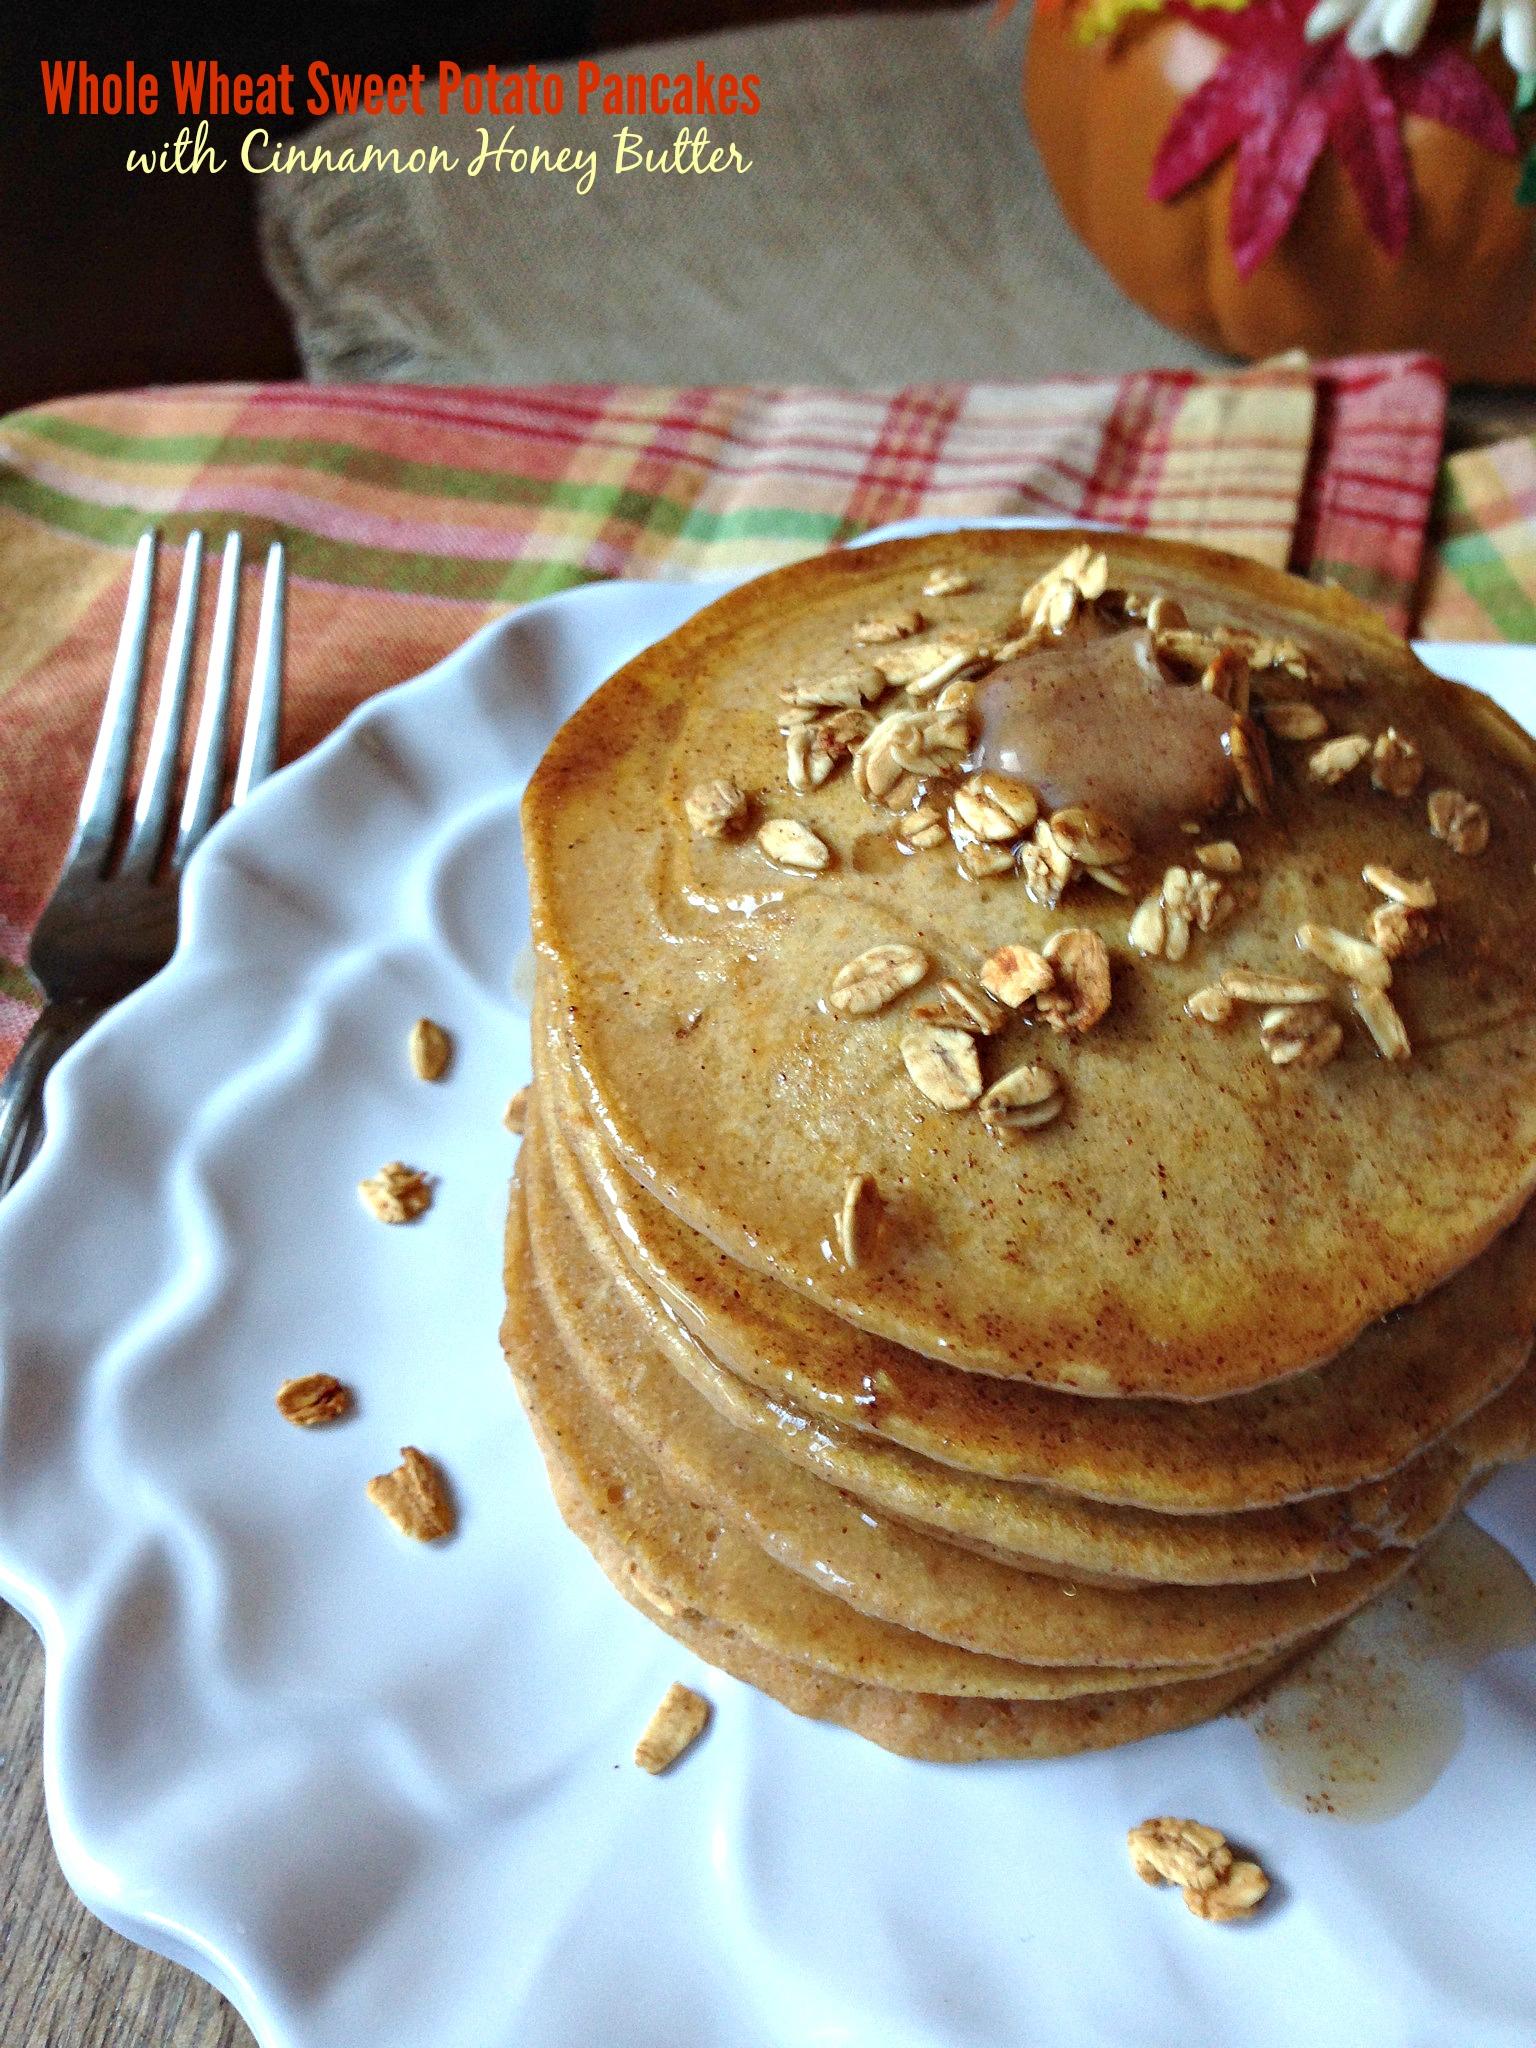 Whole Wheat Sweet Potato Pancakes with Cinnamon Honey Butter